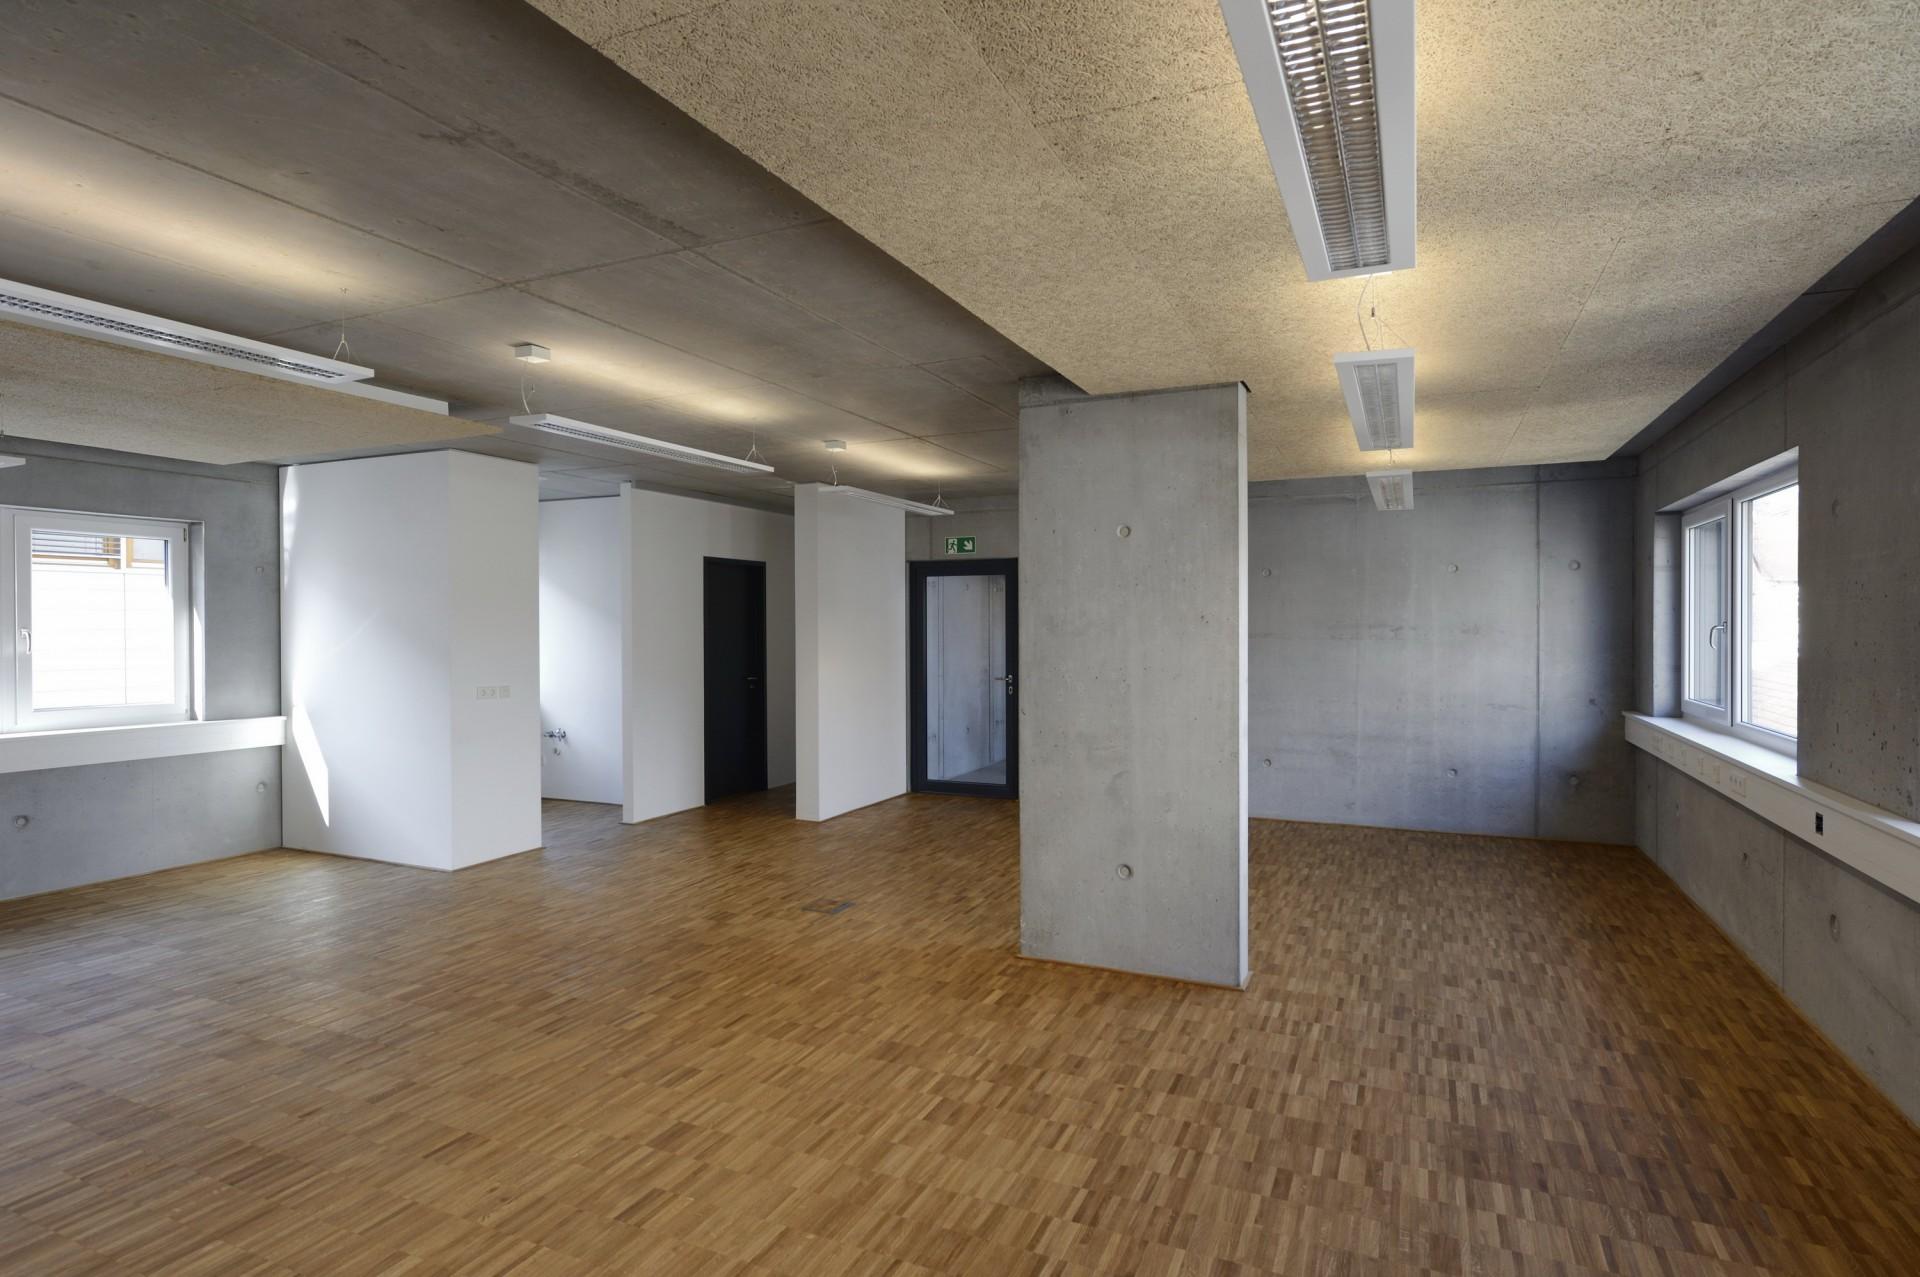 https://www.jentz-bau.de/media/pages/projekte/kmu-loft-wohn-geschaeftshaus/2725454153-1605622388/dhs_kfurt_033.jpg